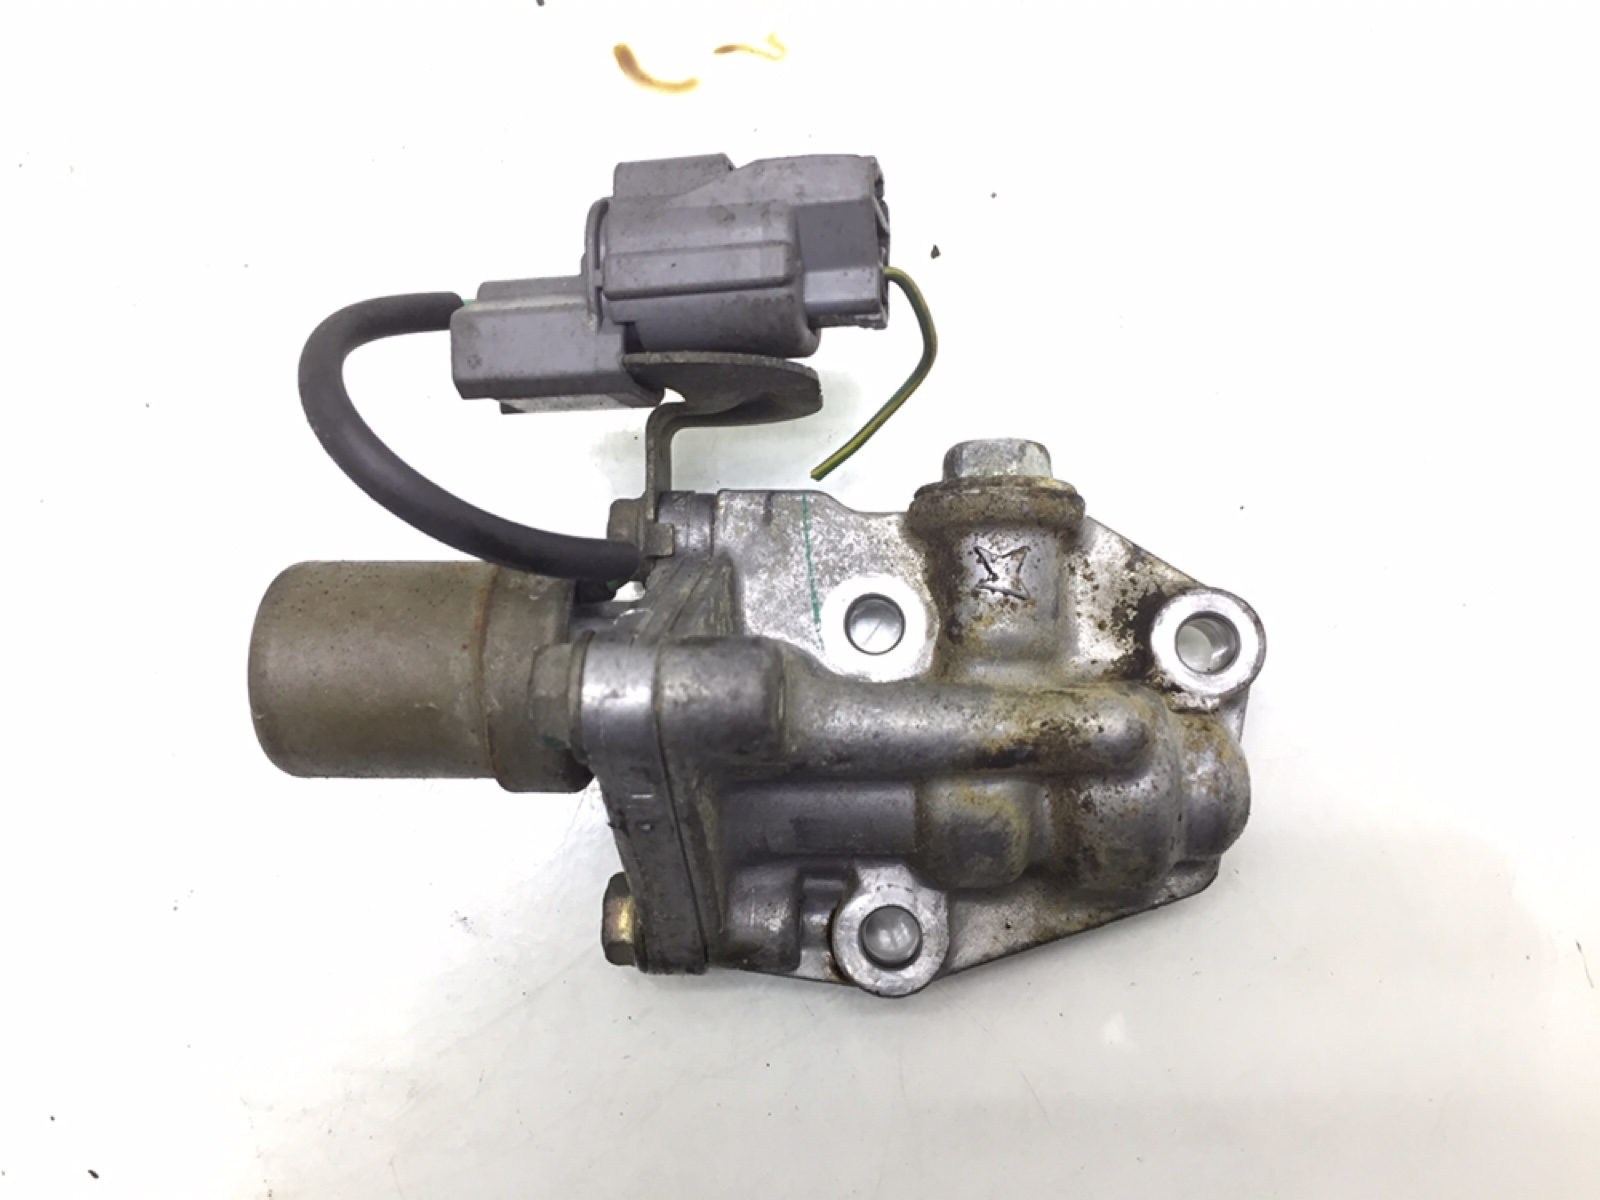 Фазорегулятор Honda Accord 1.8 I 2000 (б/у)